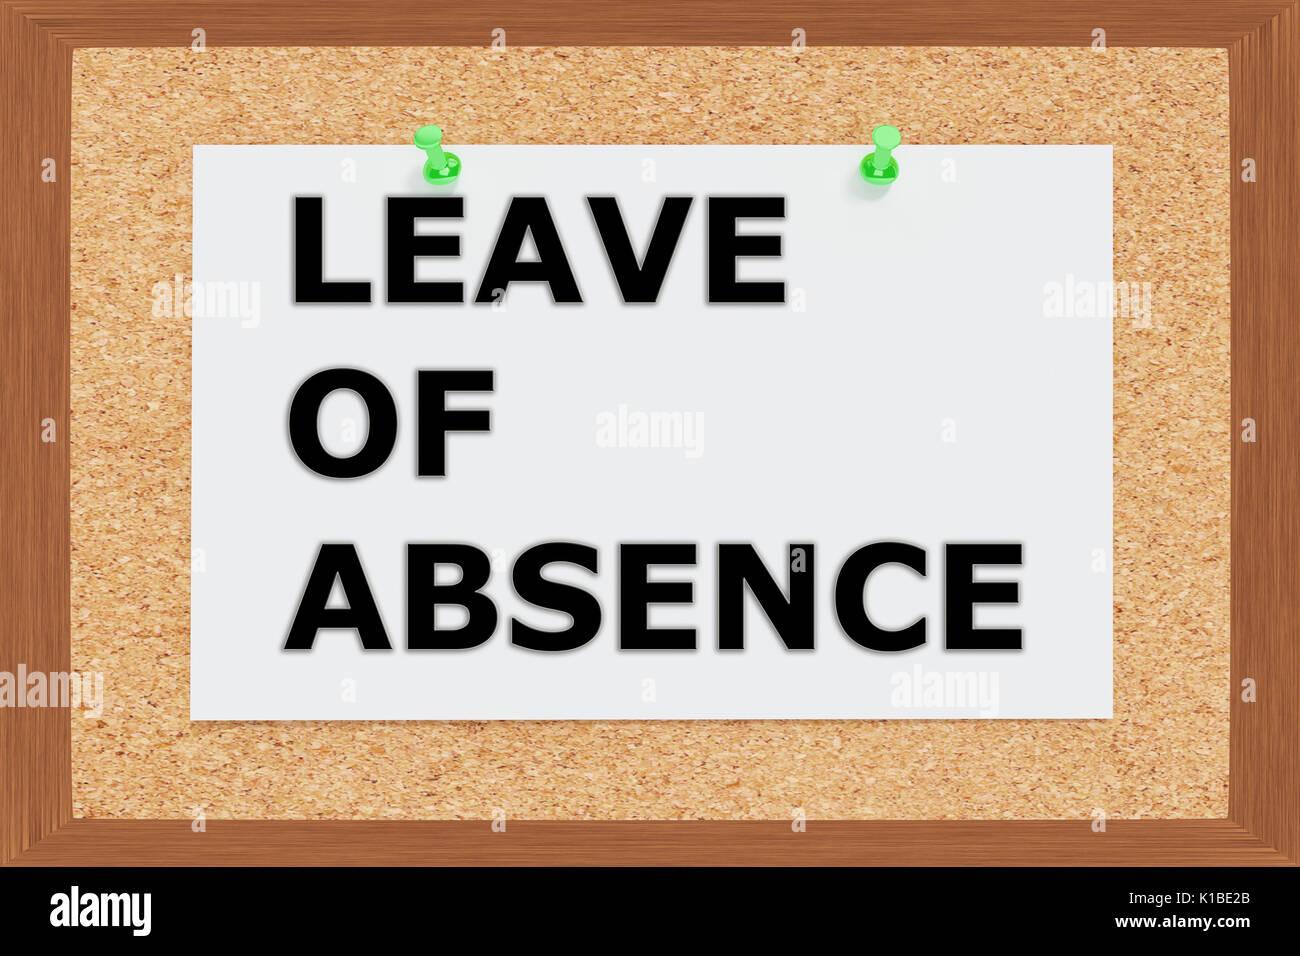 Render illustration of Leave of Absence title on cork board - Stock Image